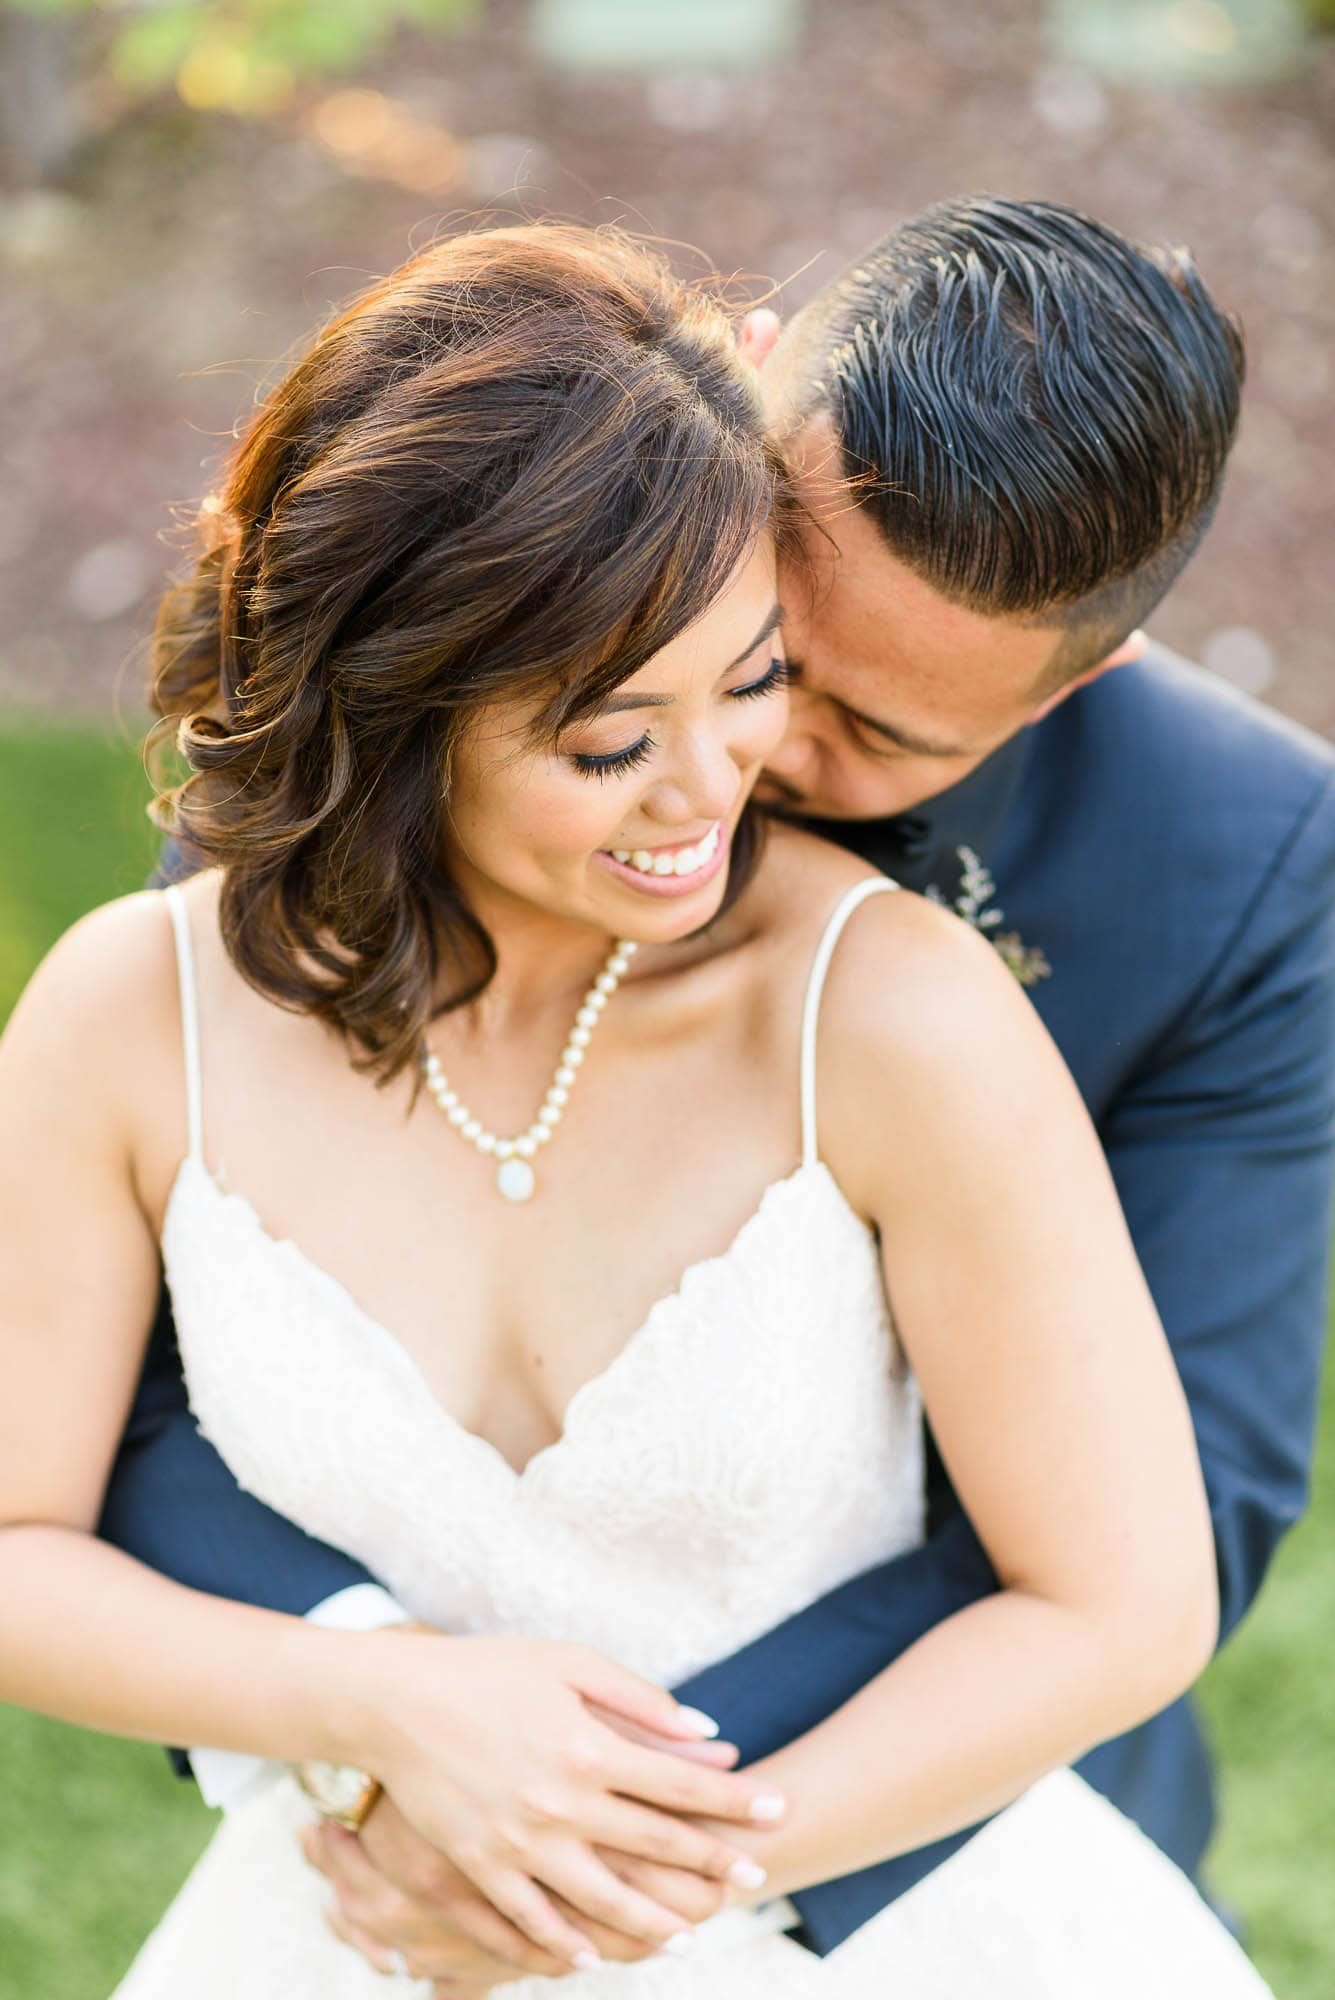 038_Alan_and_Heidi_Wedding_Karla_Paolo